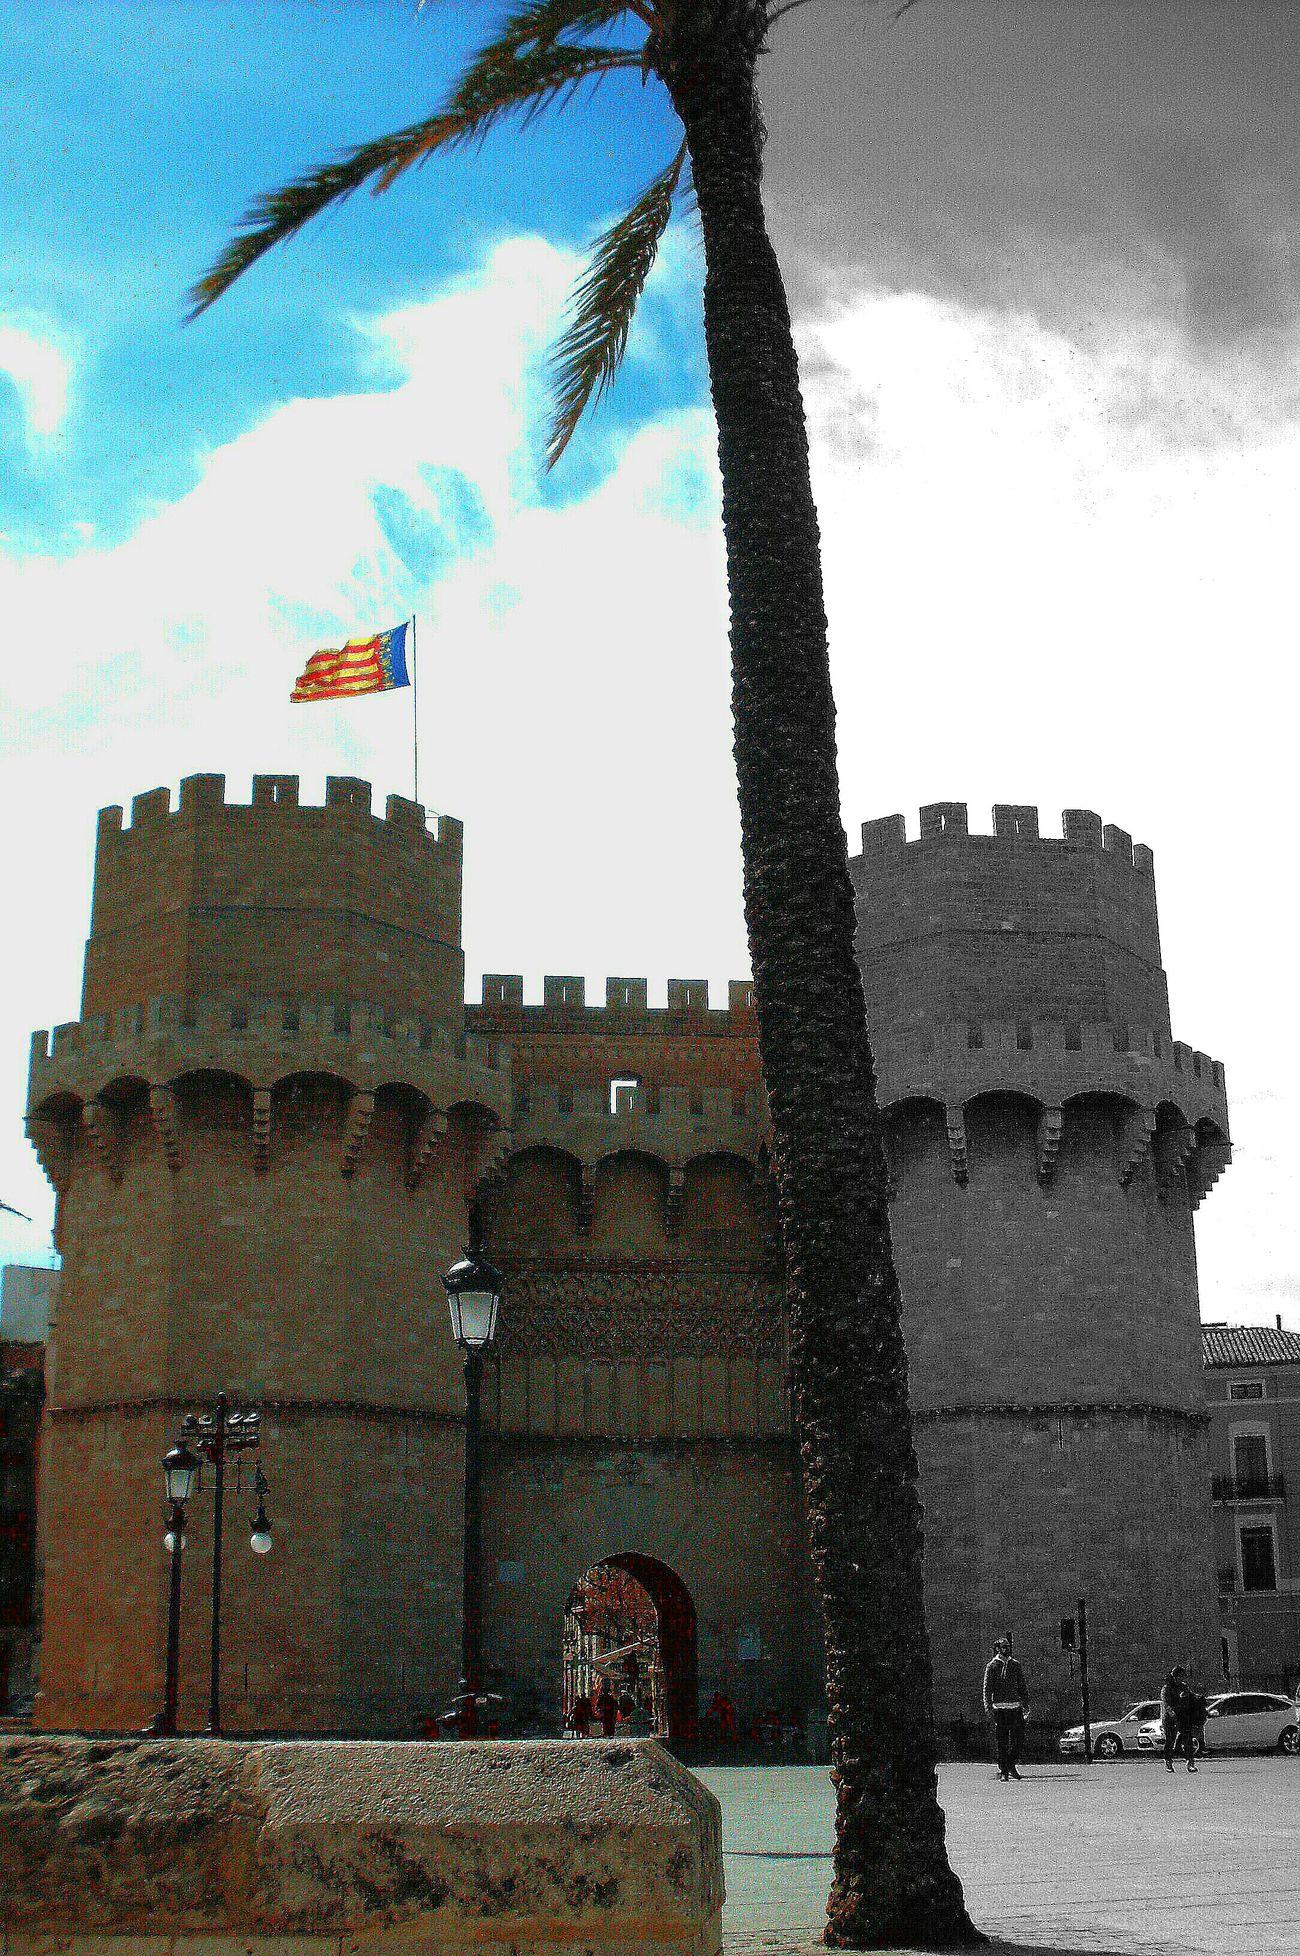 Valencia, Spain Castle Half And Half Palm Tree Flag Torres Torres De Serrano Torresdeserrano porta antiche mura